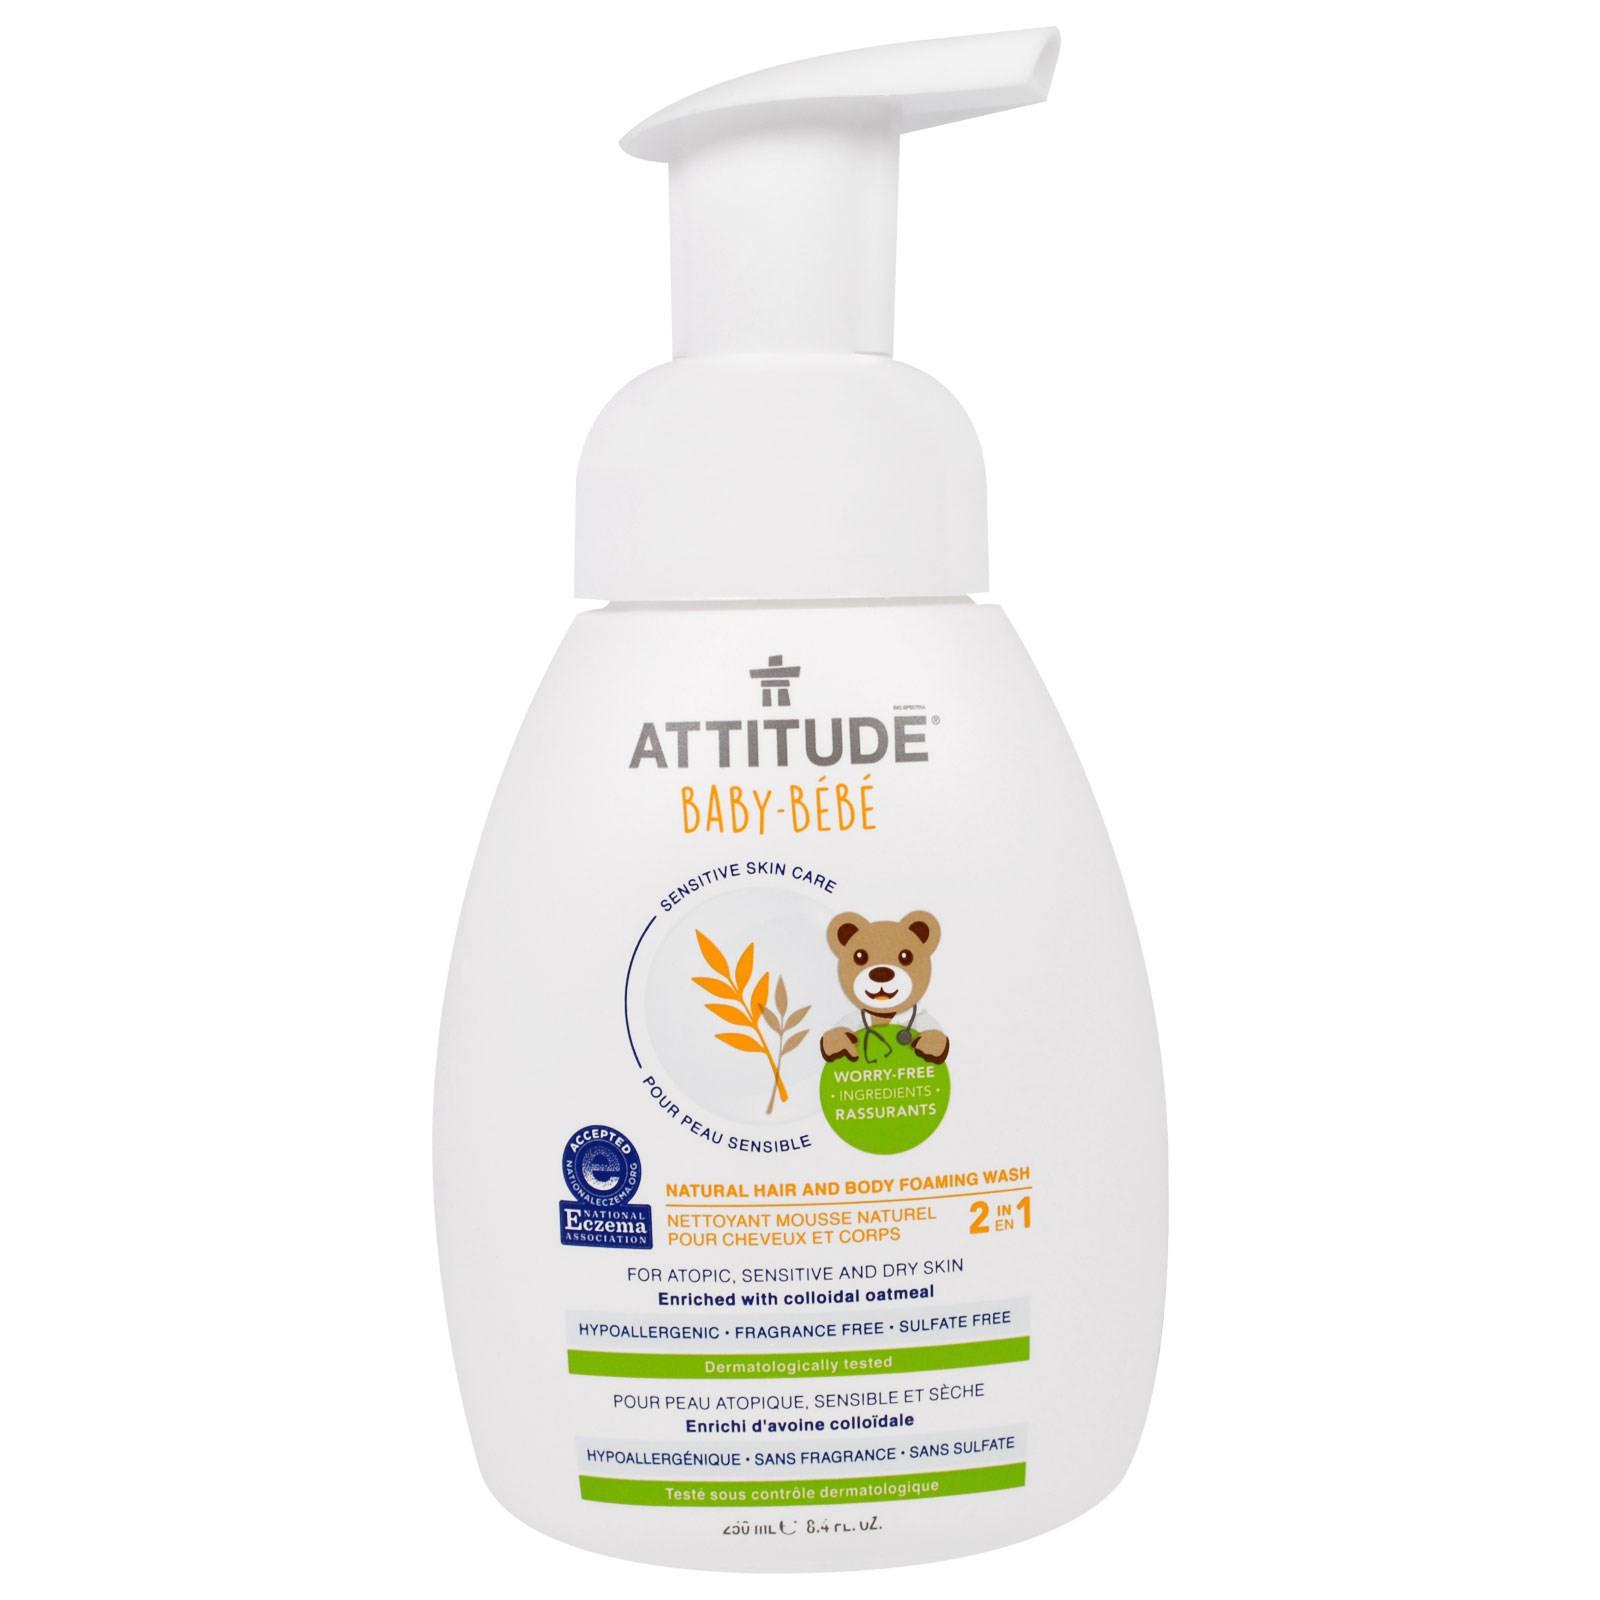 Hair and Body Foaming Wash - sensitive skin